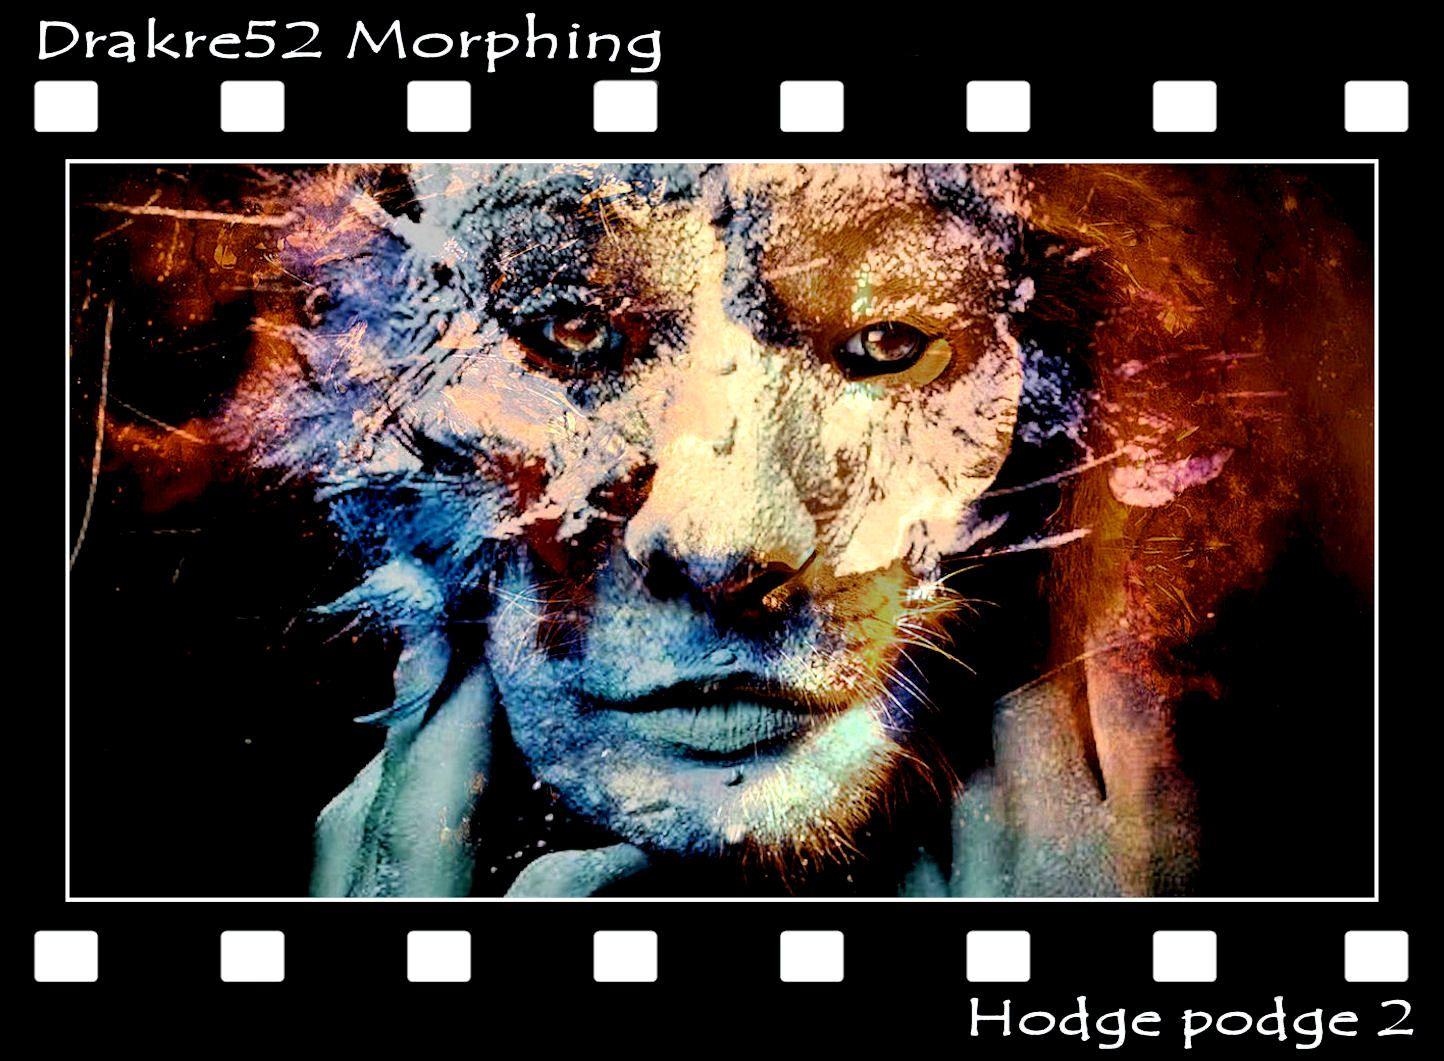 Hodge podge II Morphing. Music: Karpa. Morphing: Drakre52. Film: https://youtu.be/yey1sXwShTc Album: https://plus.google.com/u/0/b/115112554268463328907/collection/g1BjBB Album: https://nl.pinterest.com/Drakre52/hodge-podge/